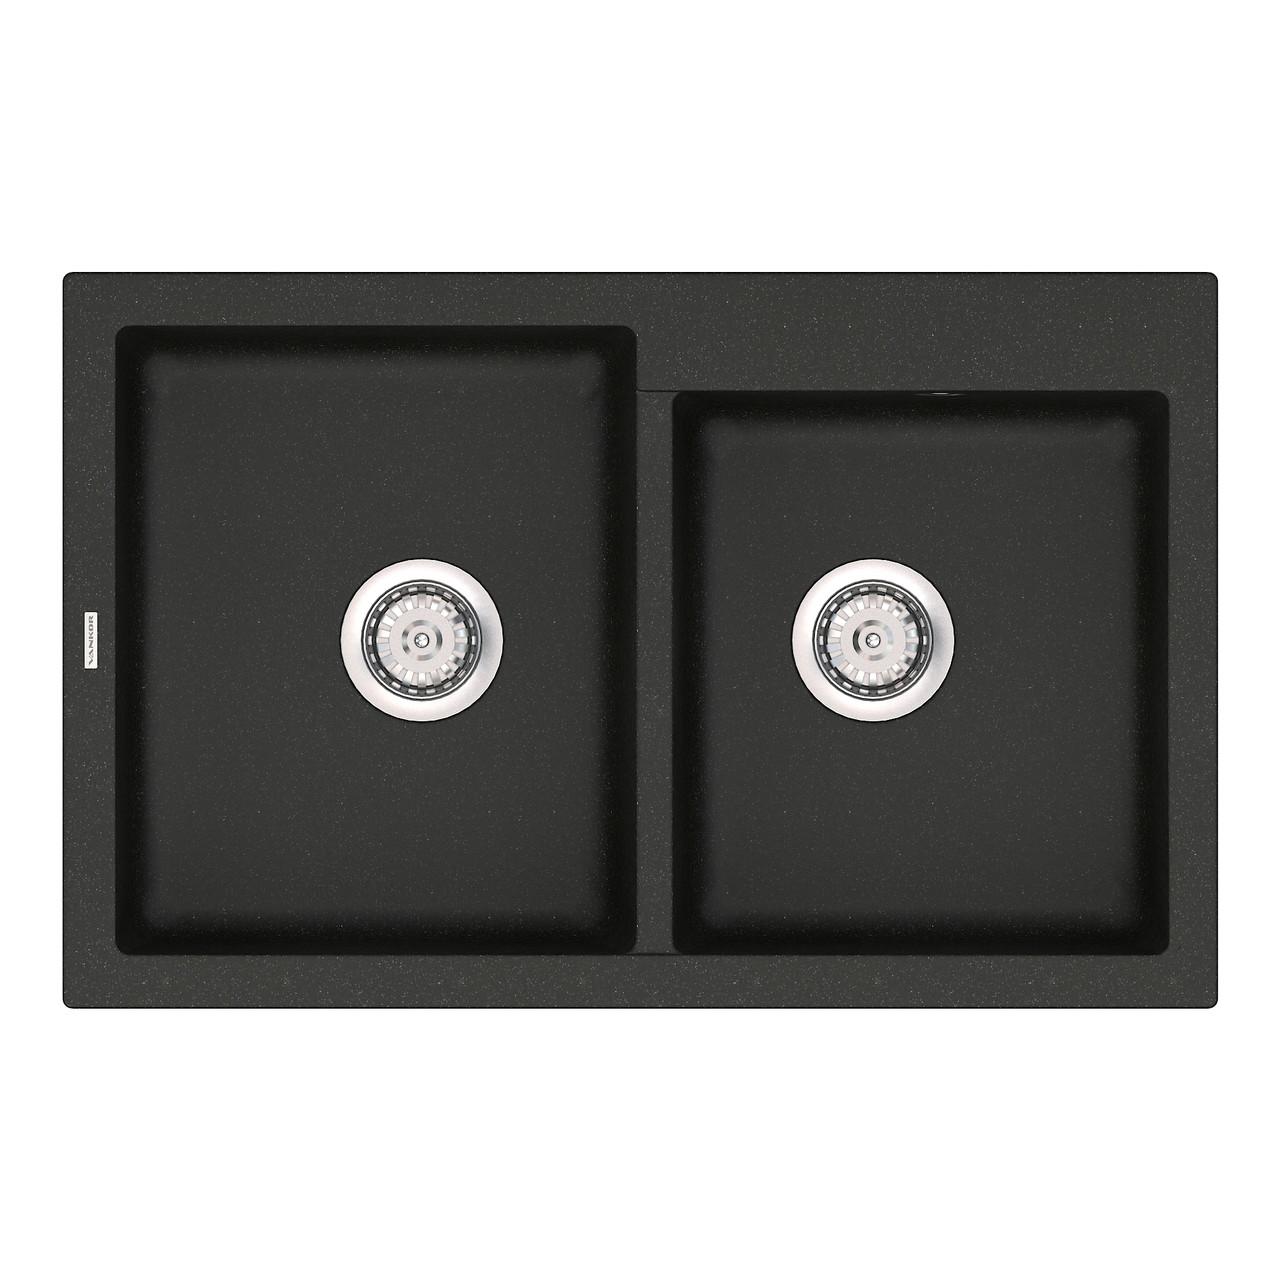 Кухонная мойка кварц 51*80 см VANKOR Orman OMP 05.80 Black